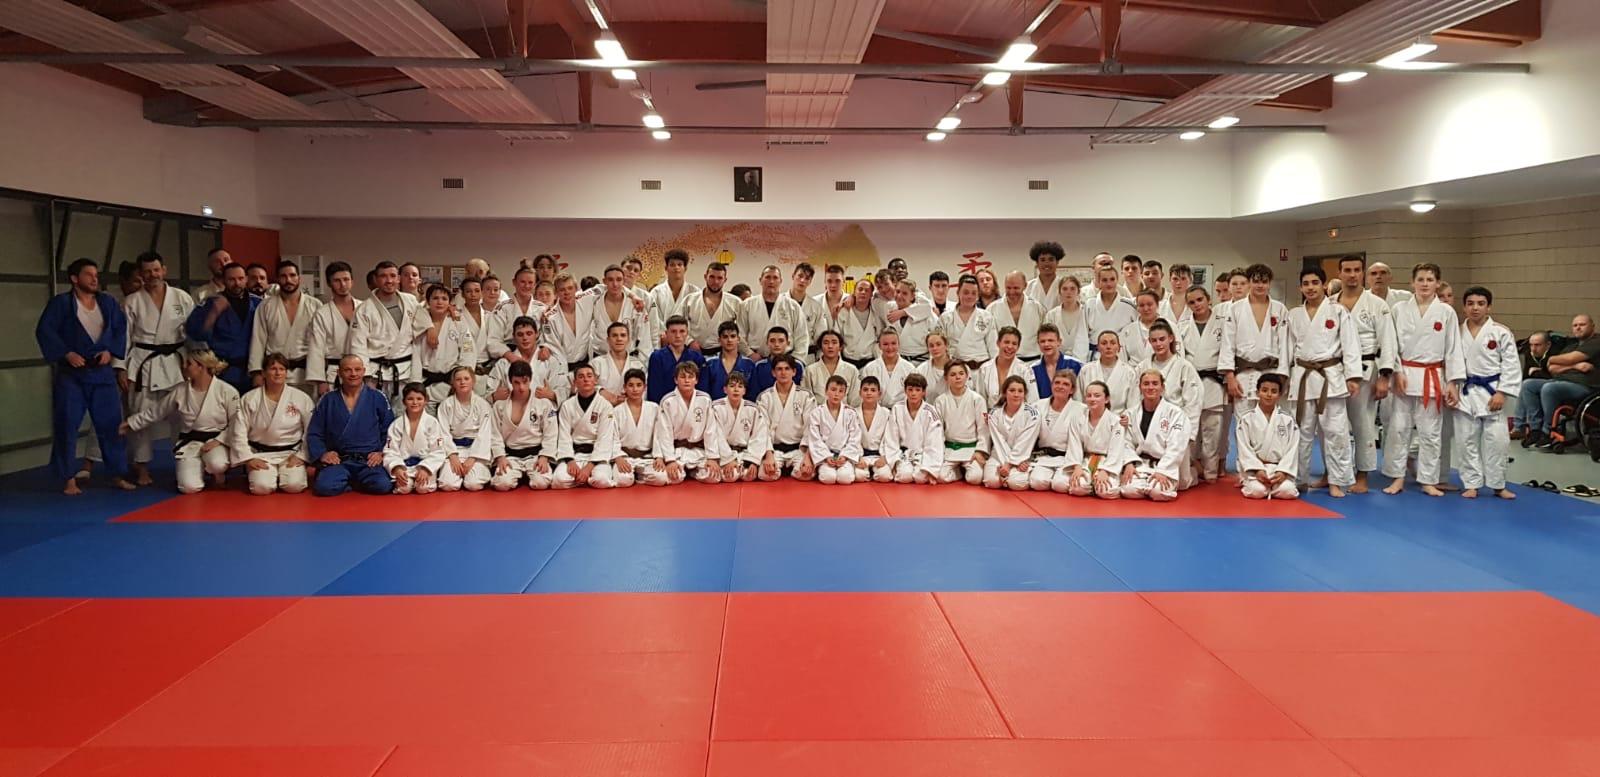 Interreg Judo Training - St. Julien-lès-Metz 19.12.2019